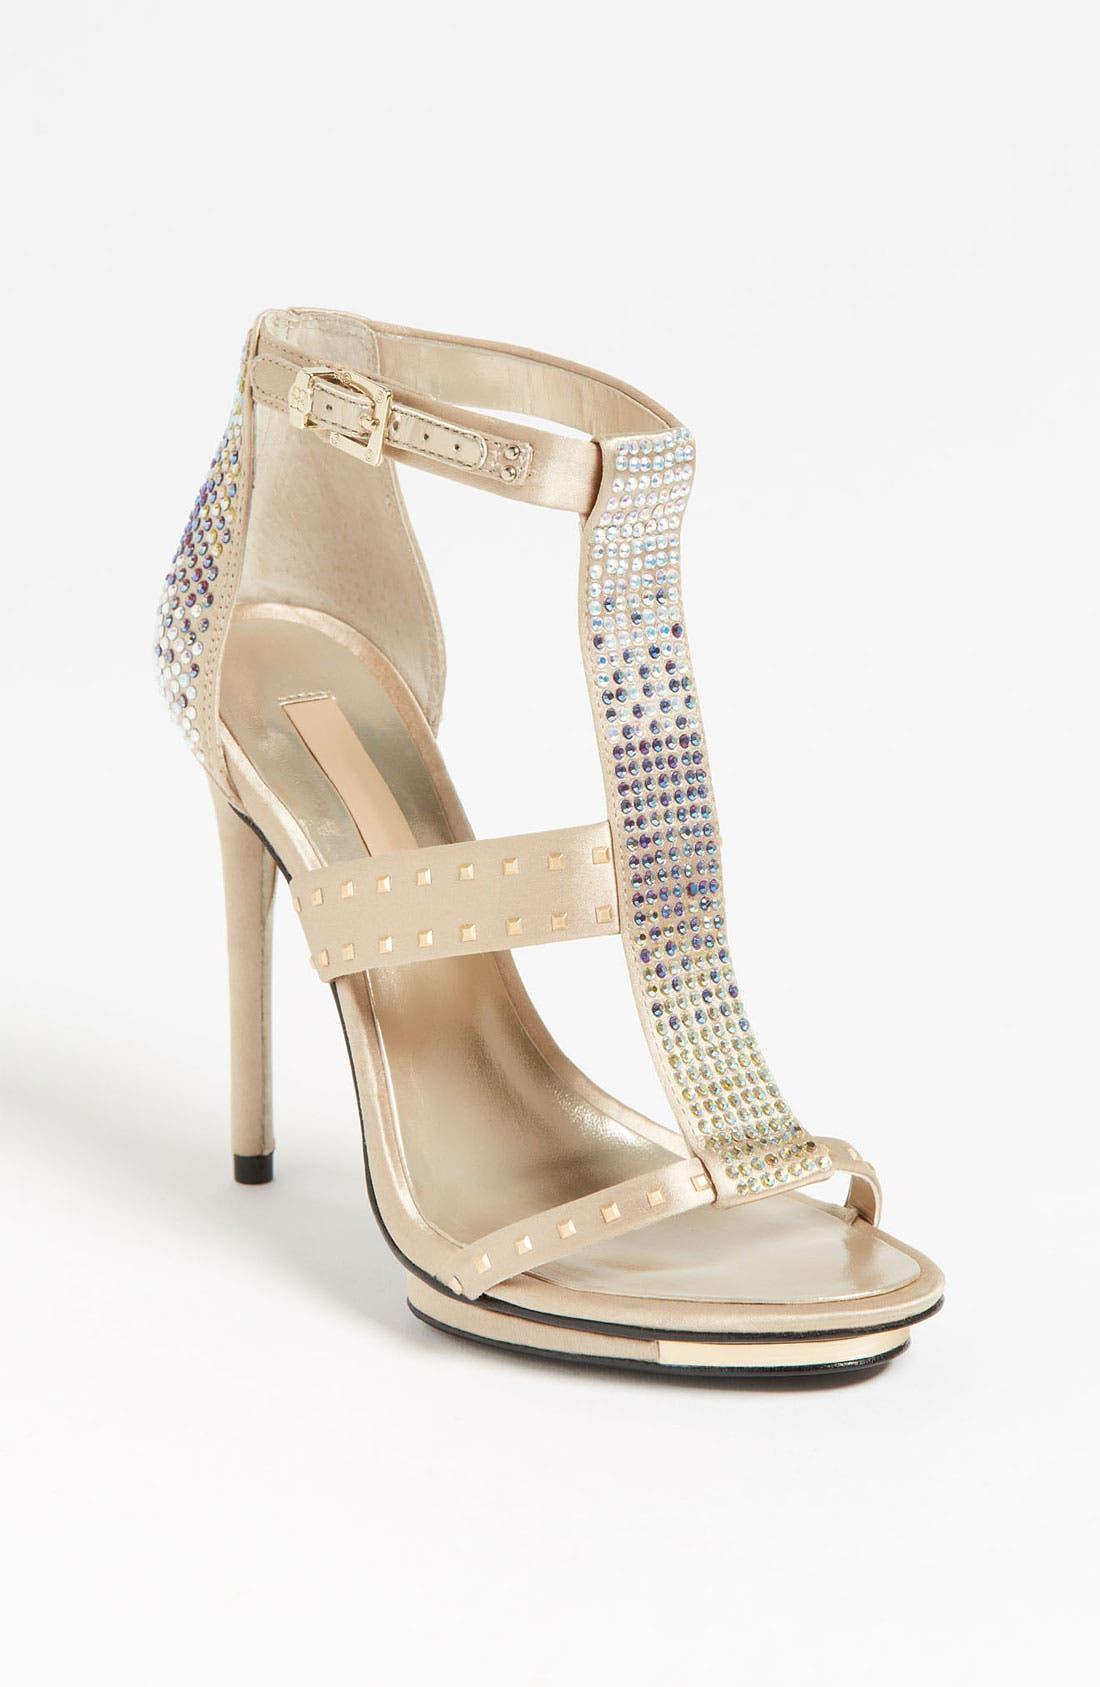 Main Image - BCBGMAXAZRIA 'Lilie' Sandal